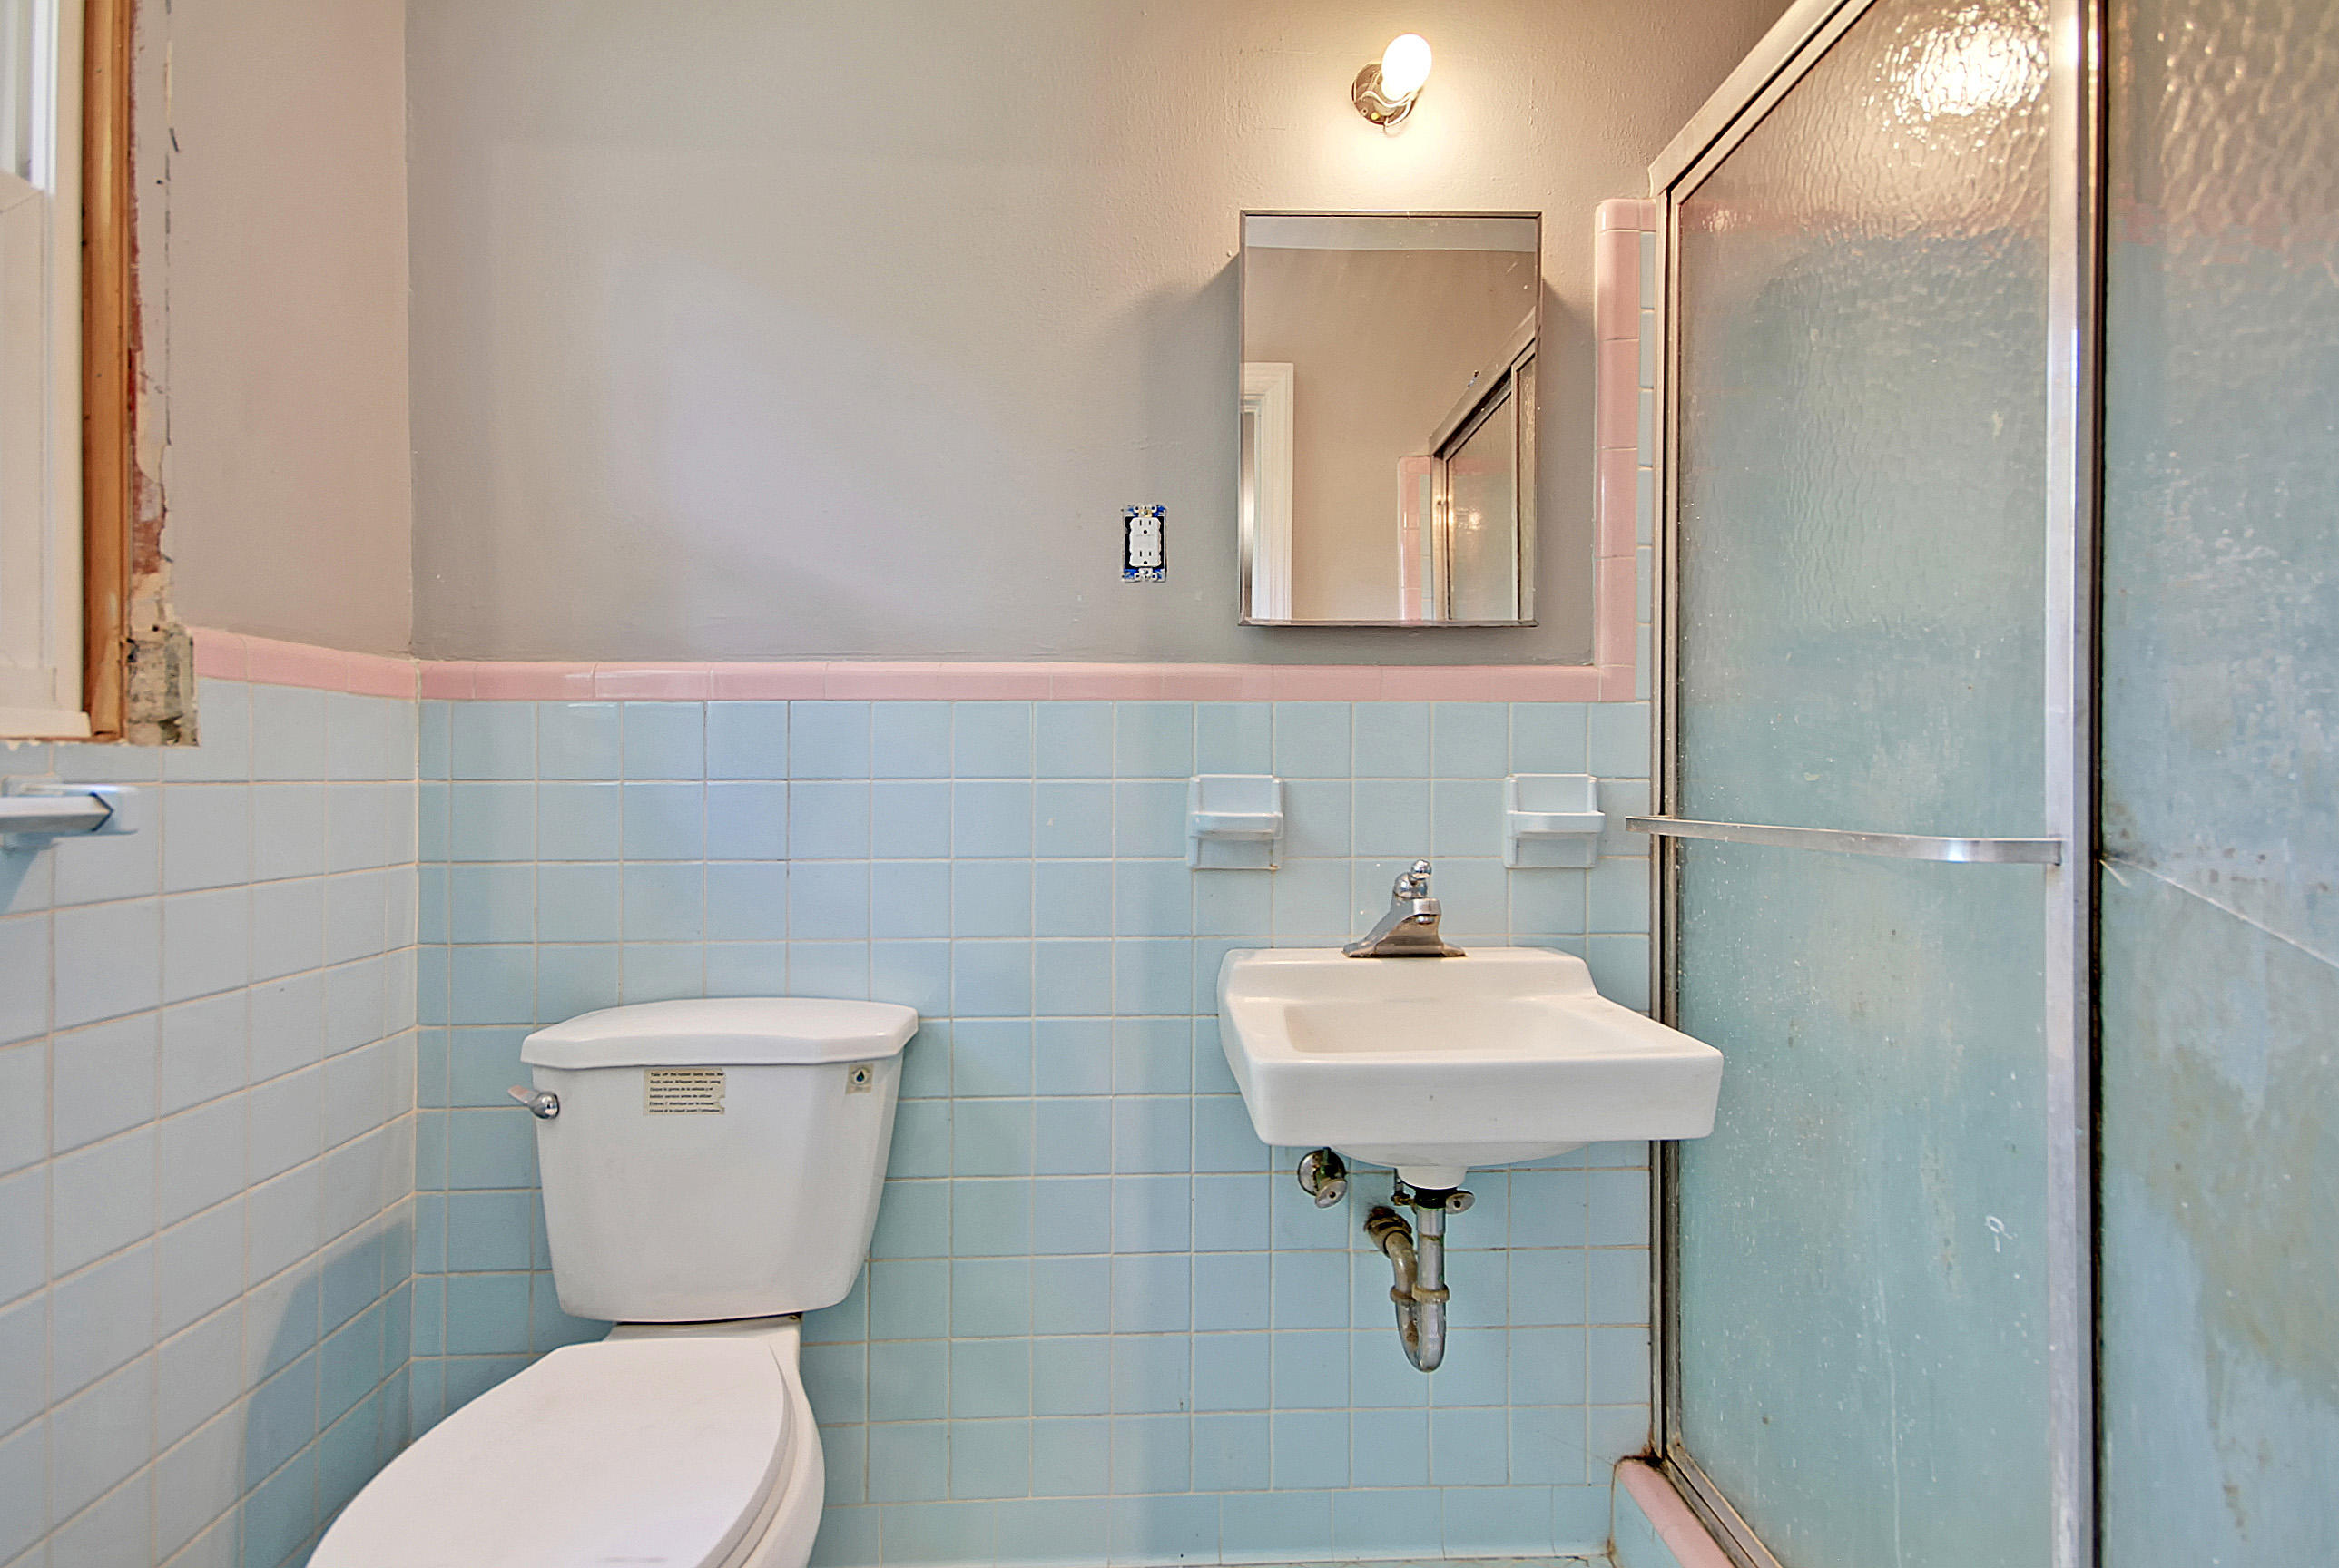 Northbridge Terrace Homes For Sale - 1094 Northbridge, Charleston, SC - 4